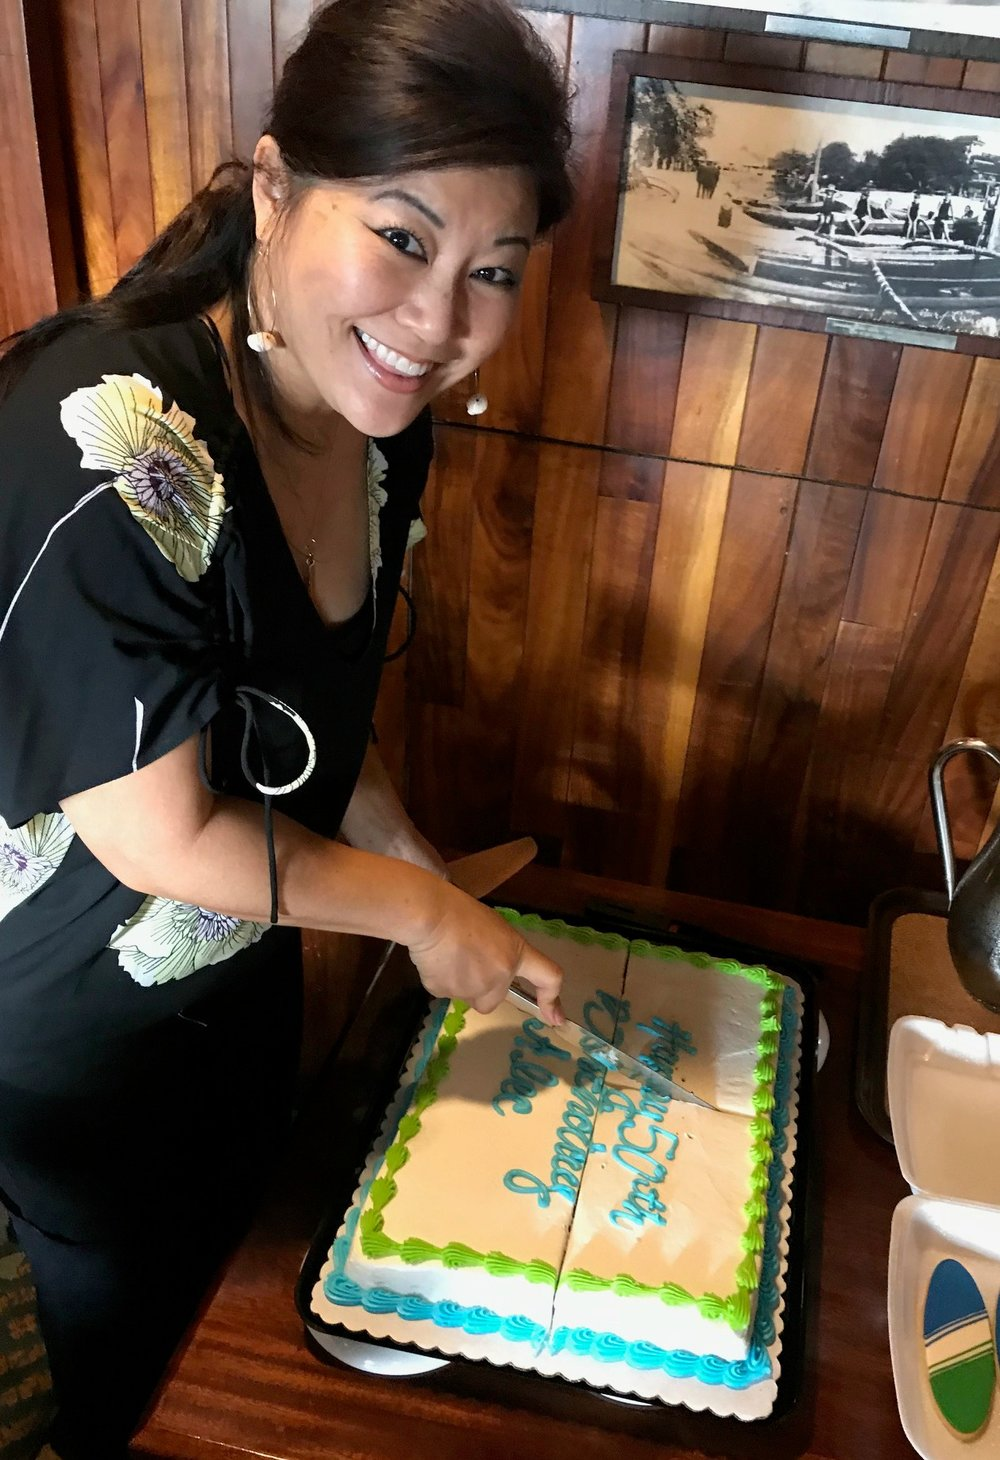 Cindy cuts the cake